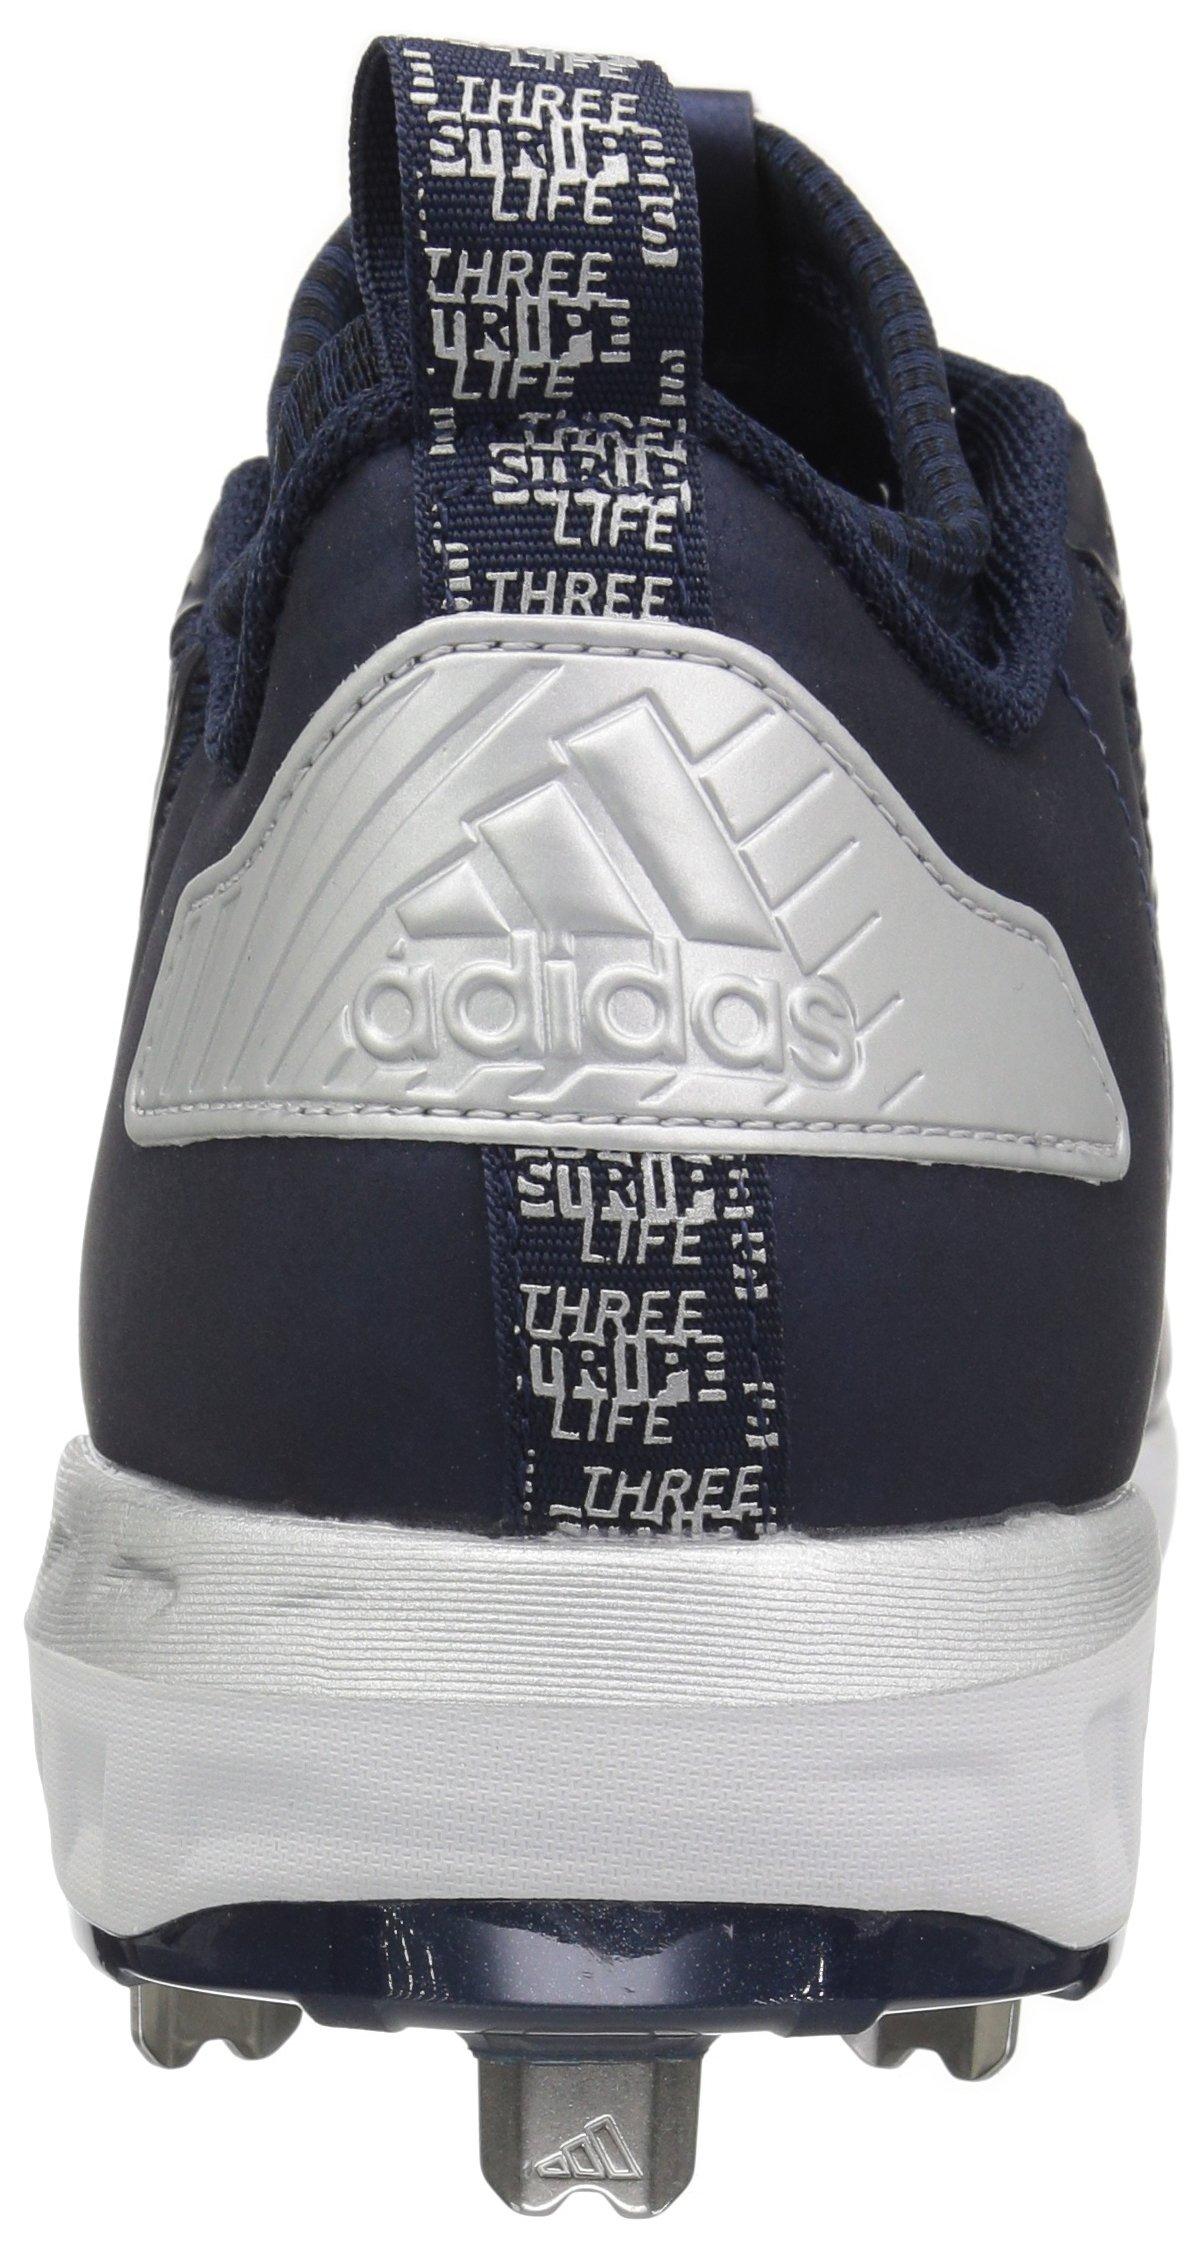 adidas Men's Freak X Carbon Mid Baseball Shoe, Collegiate Navy/White/Metallic Silver, 8 Medium US by adidas (Image #2)